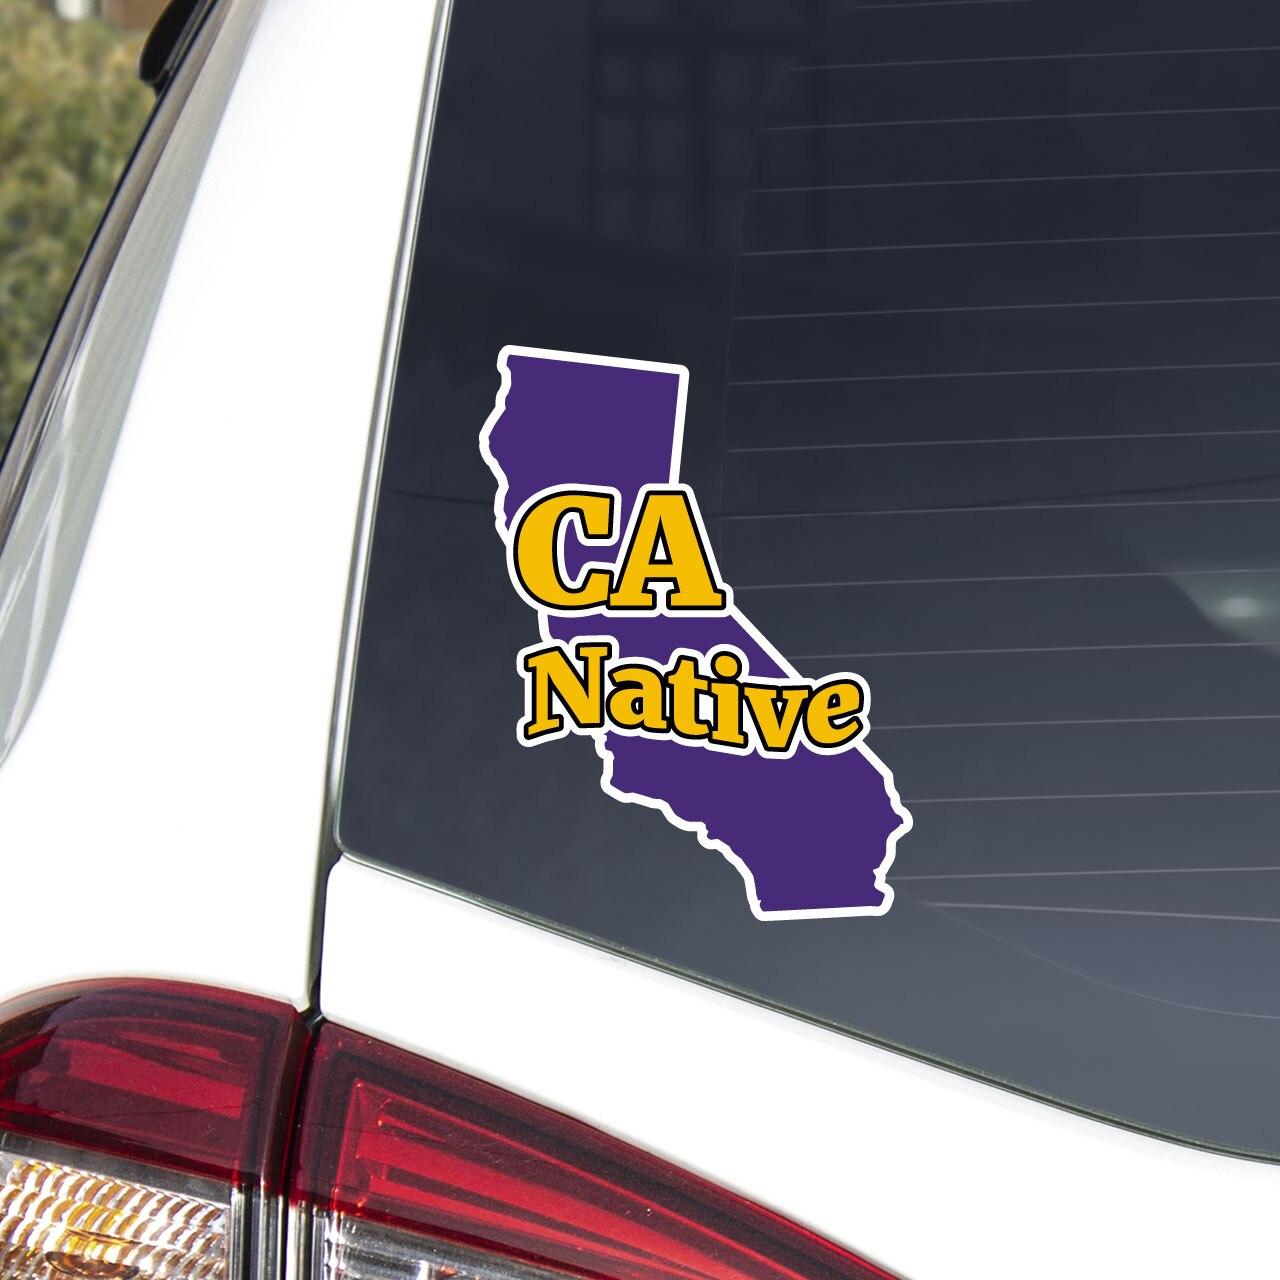 CA Native decal on car window